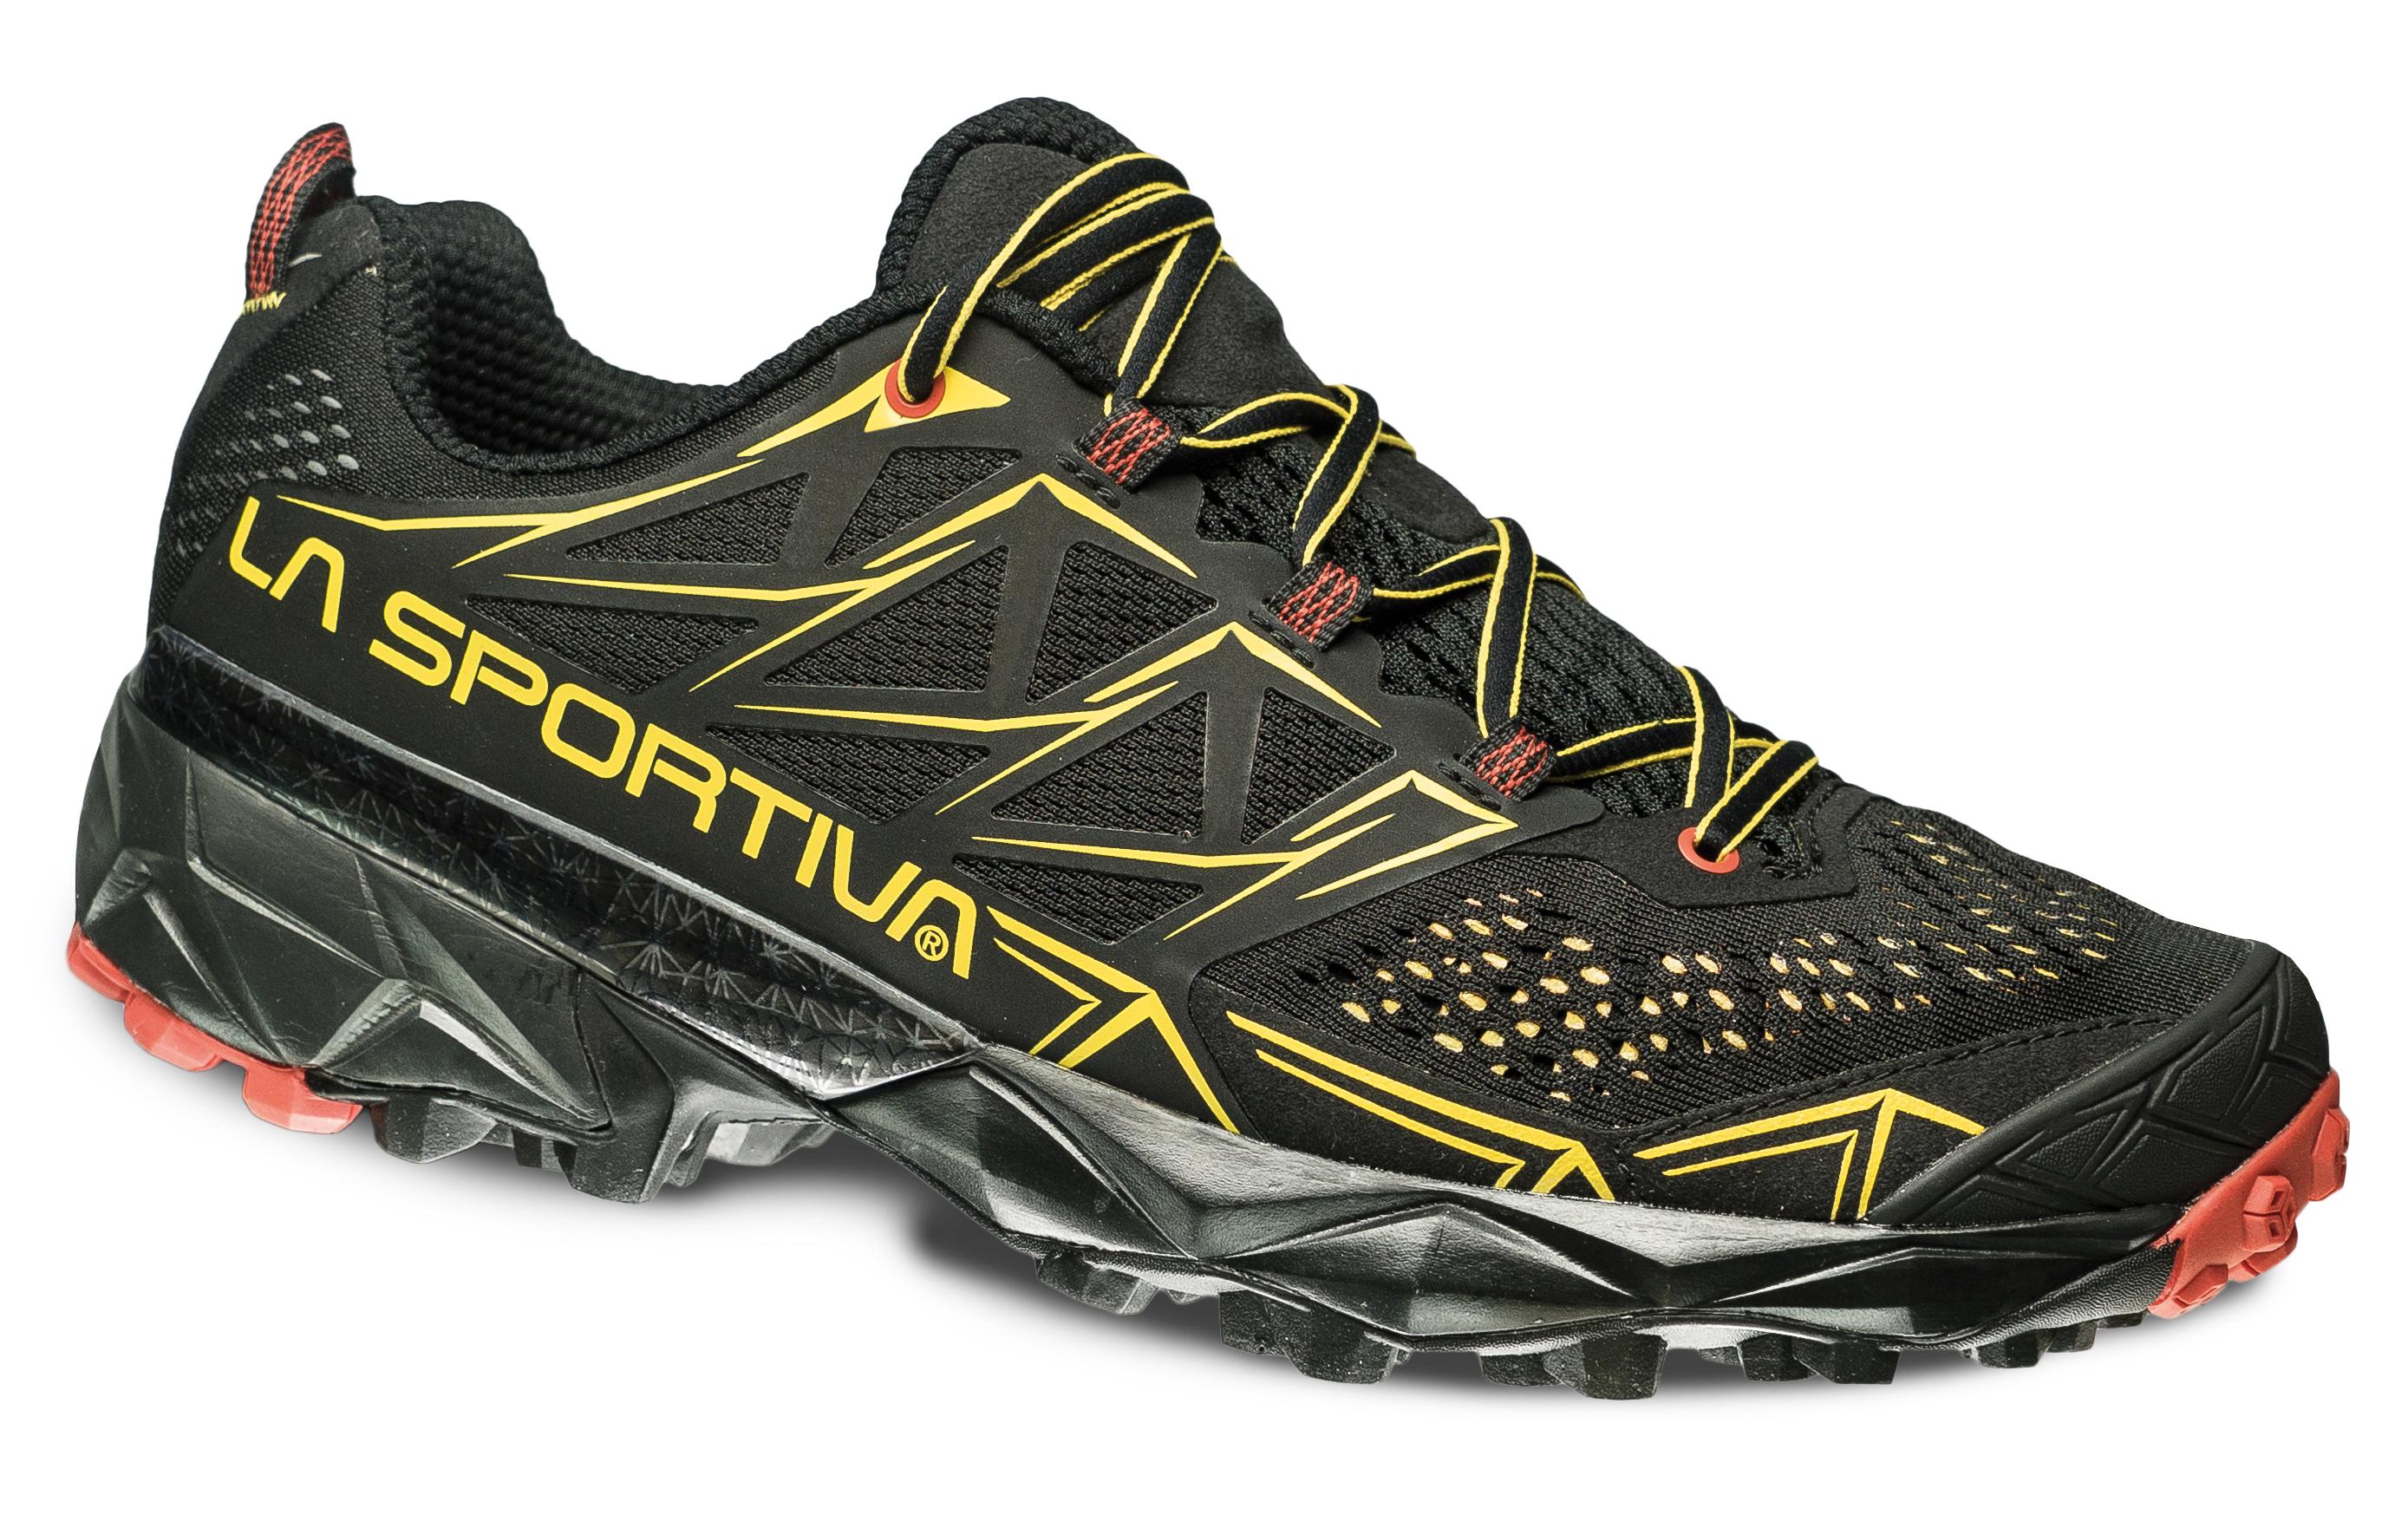 Sur Akyra Course Hommes De Sportiva Chaussures Sentier La eEYH2WD9I